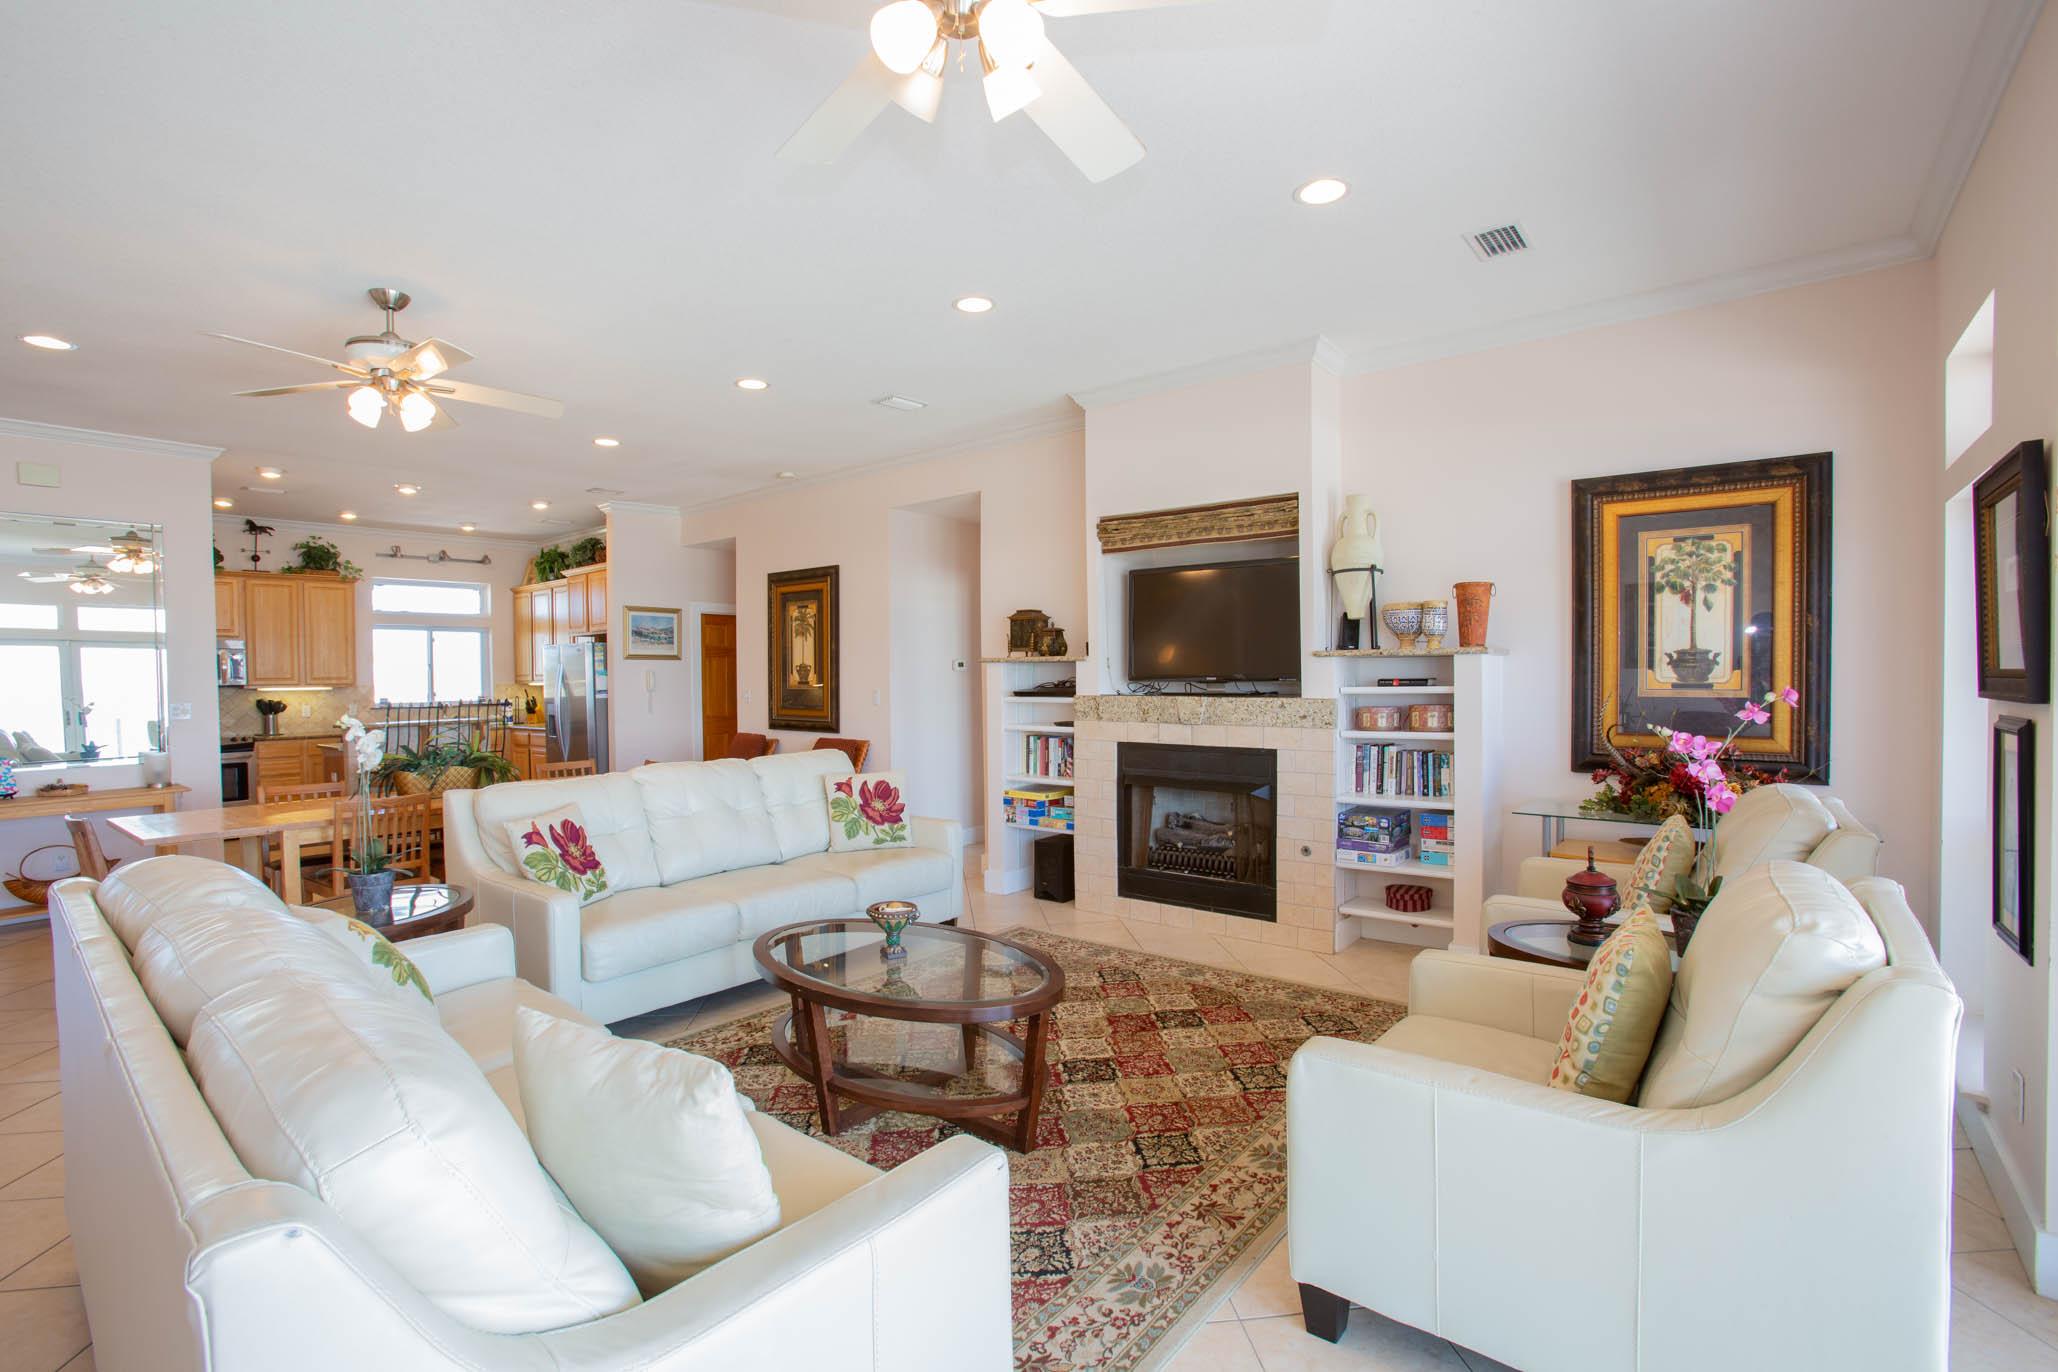 Ariola 1214 House/Cottage rental in Luxury Homes in Pensacola Beach Florida - #7